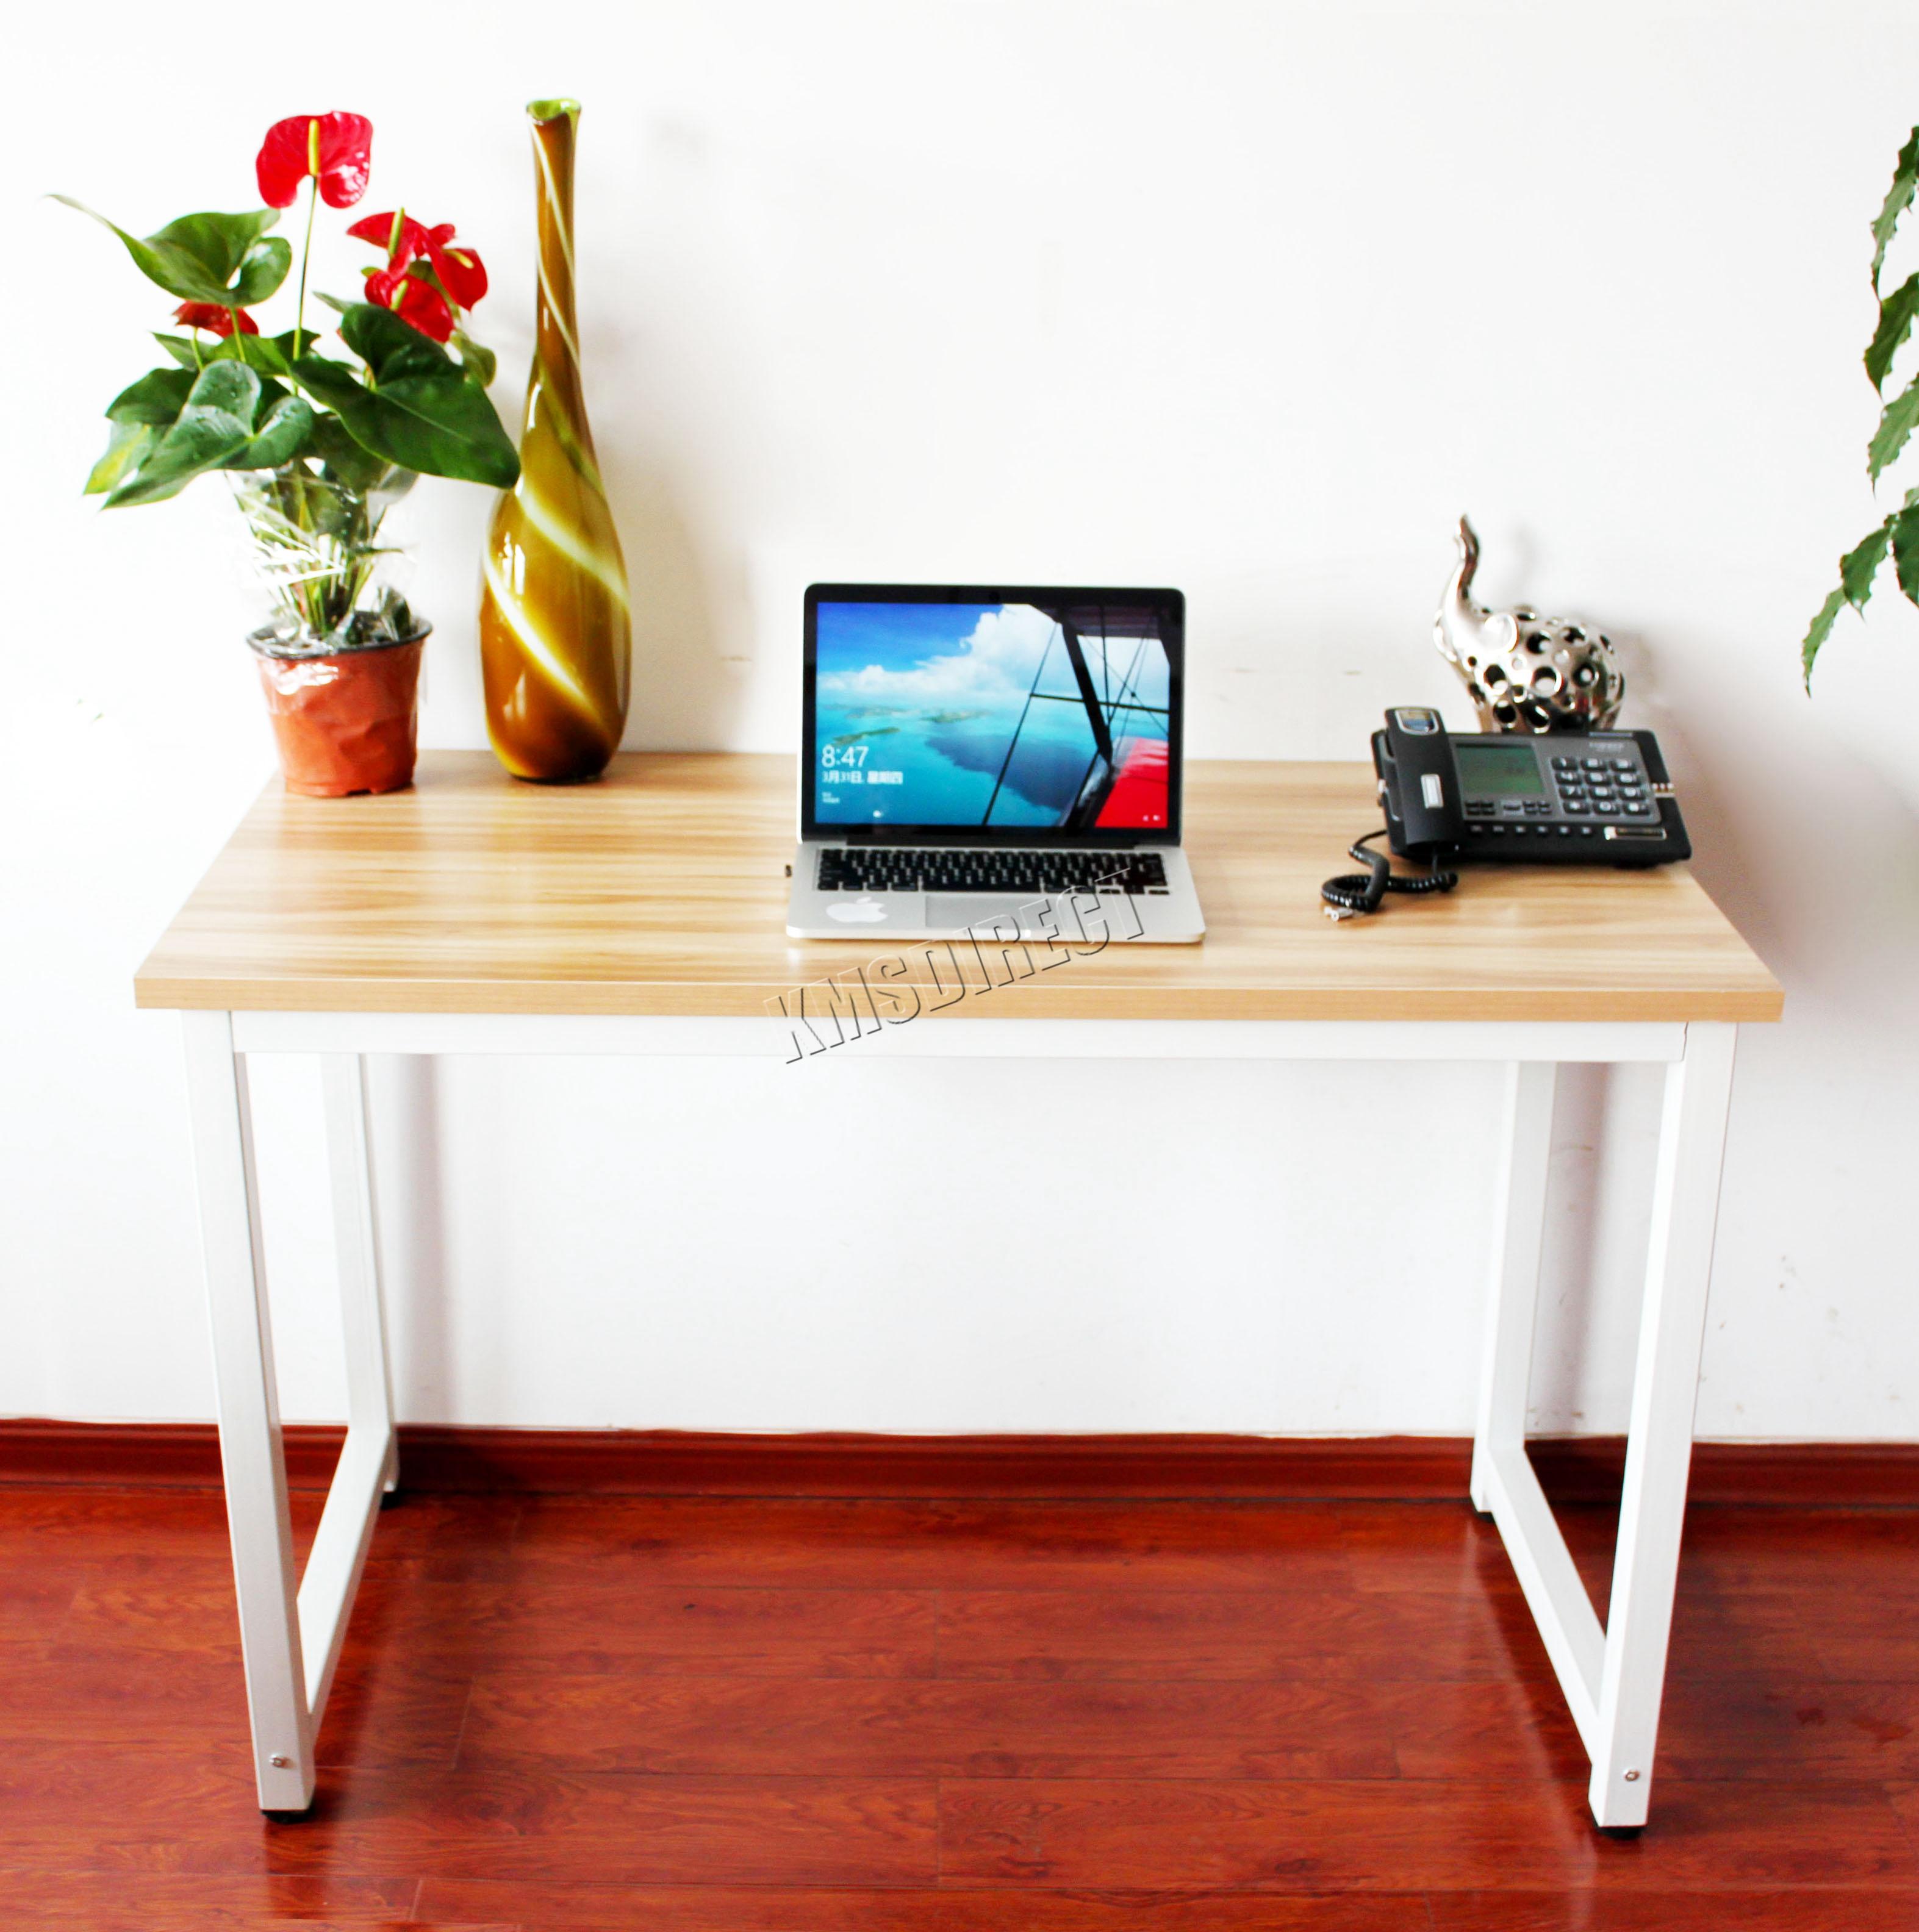 Westwood Pc Computer Desk Corner Wooden Desktop Table Office  # Table Ordi En Bois